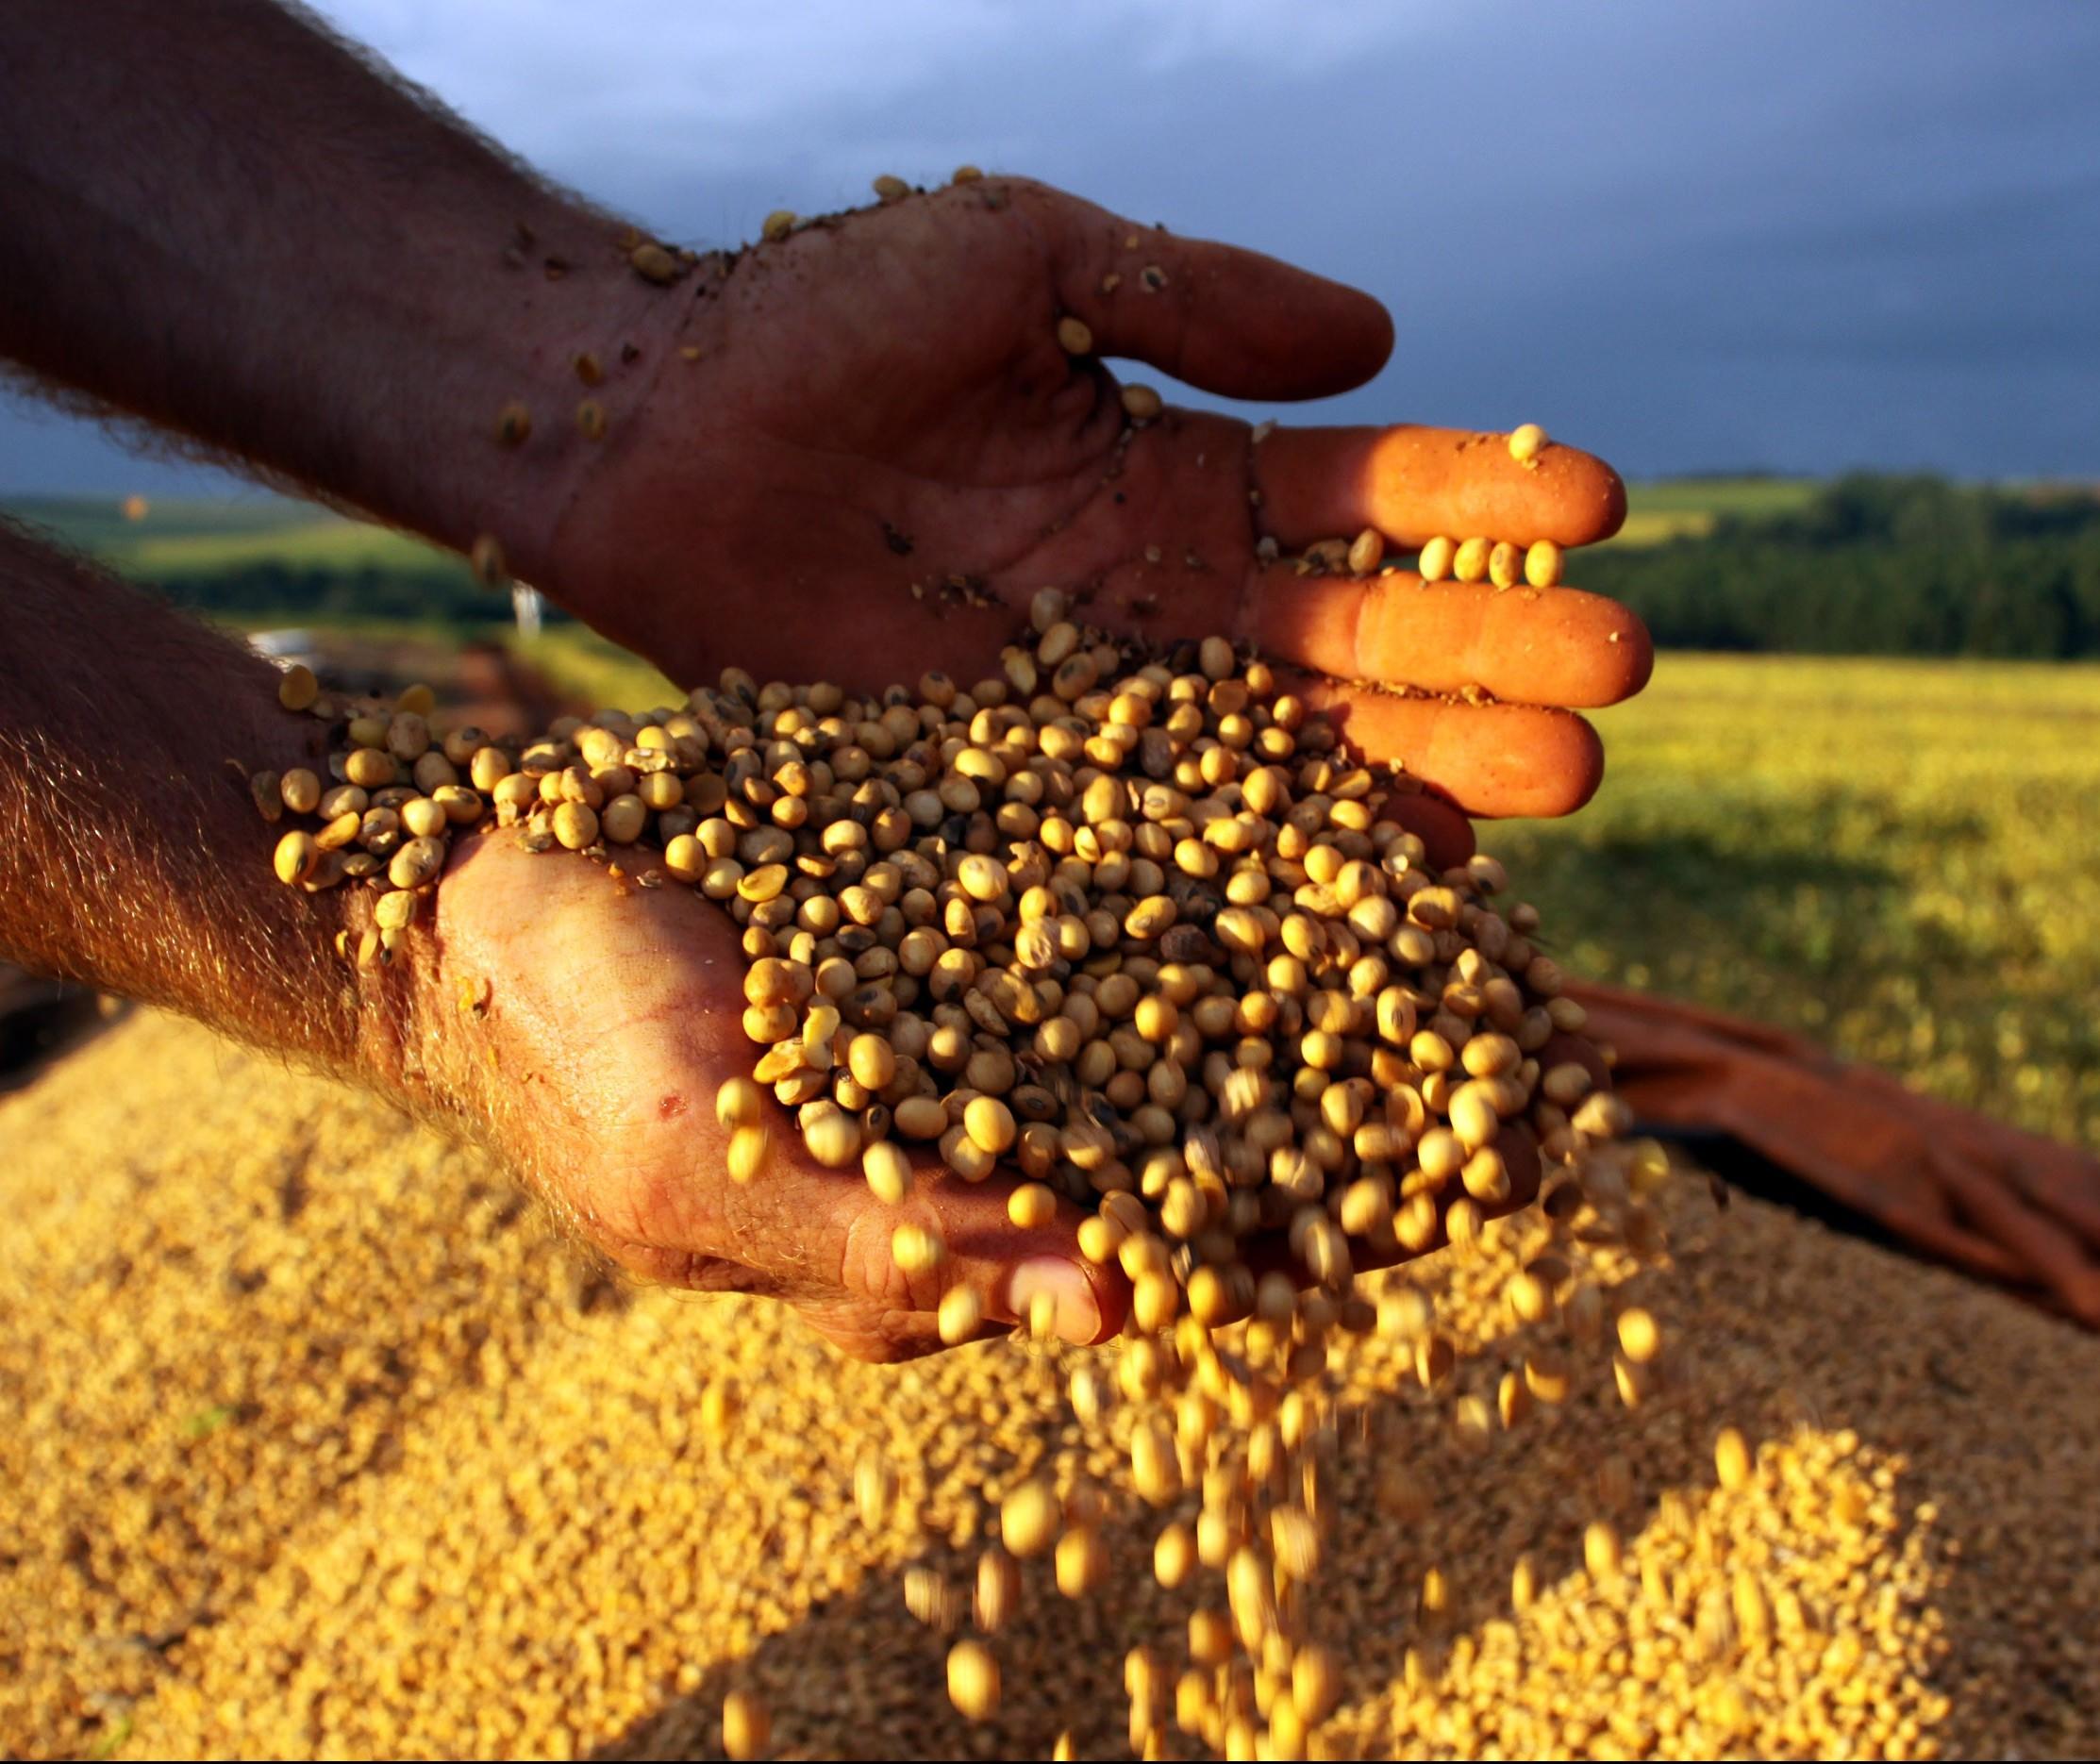 Safra de soja 2017/18 deve atingir 114 mi de toneladas